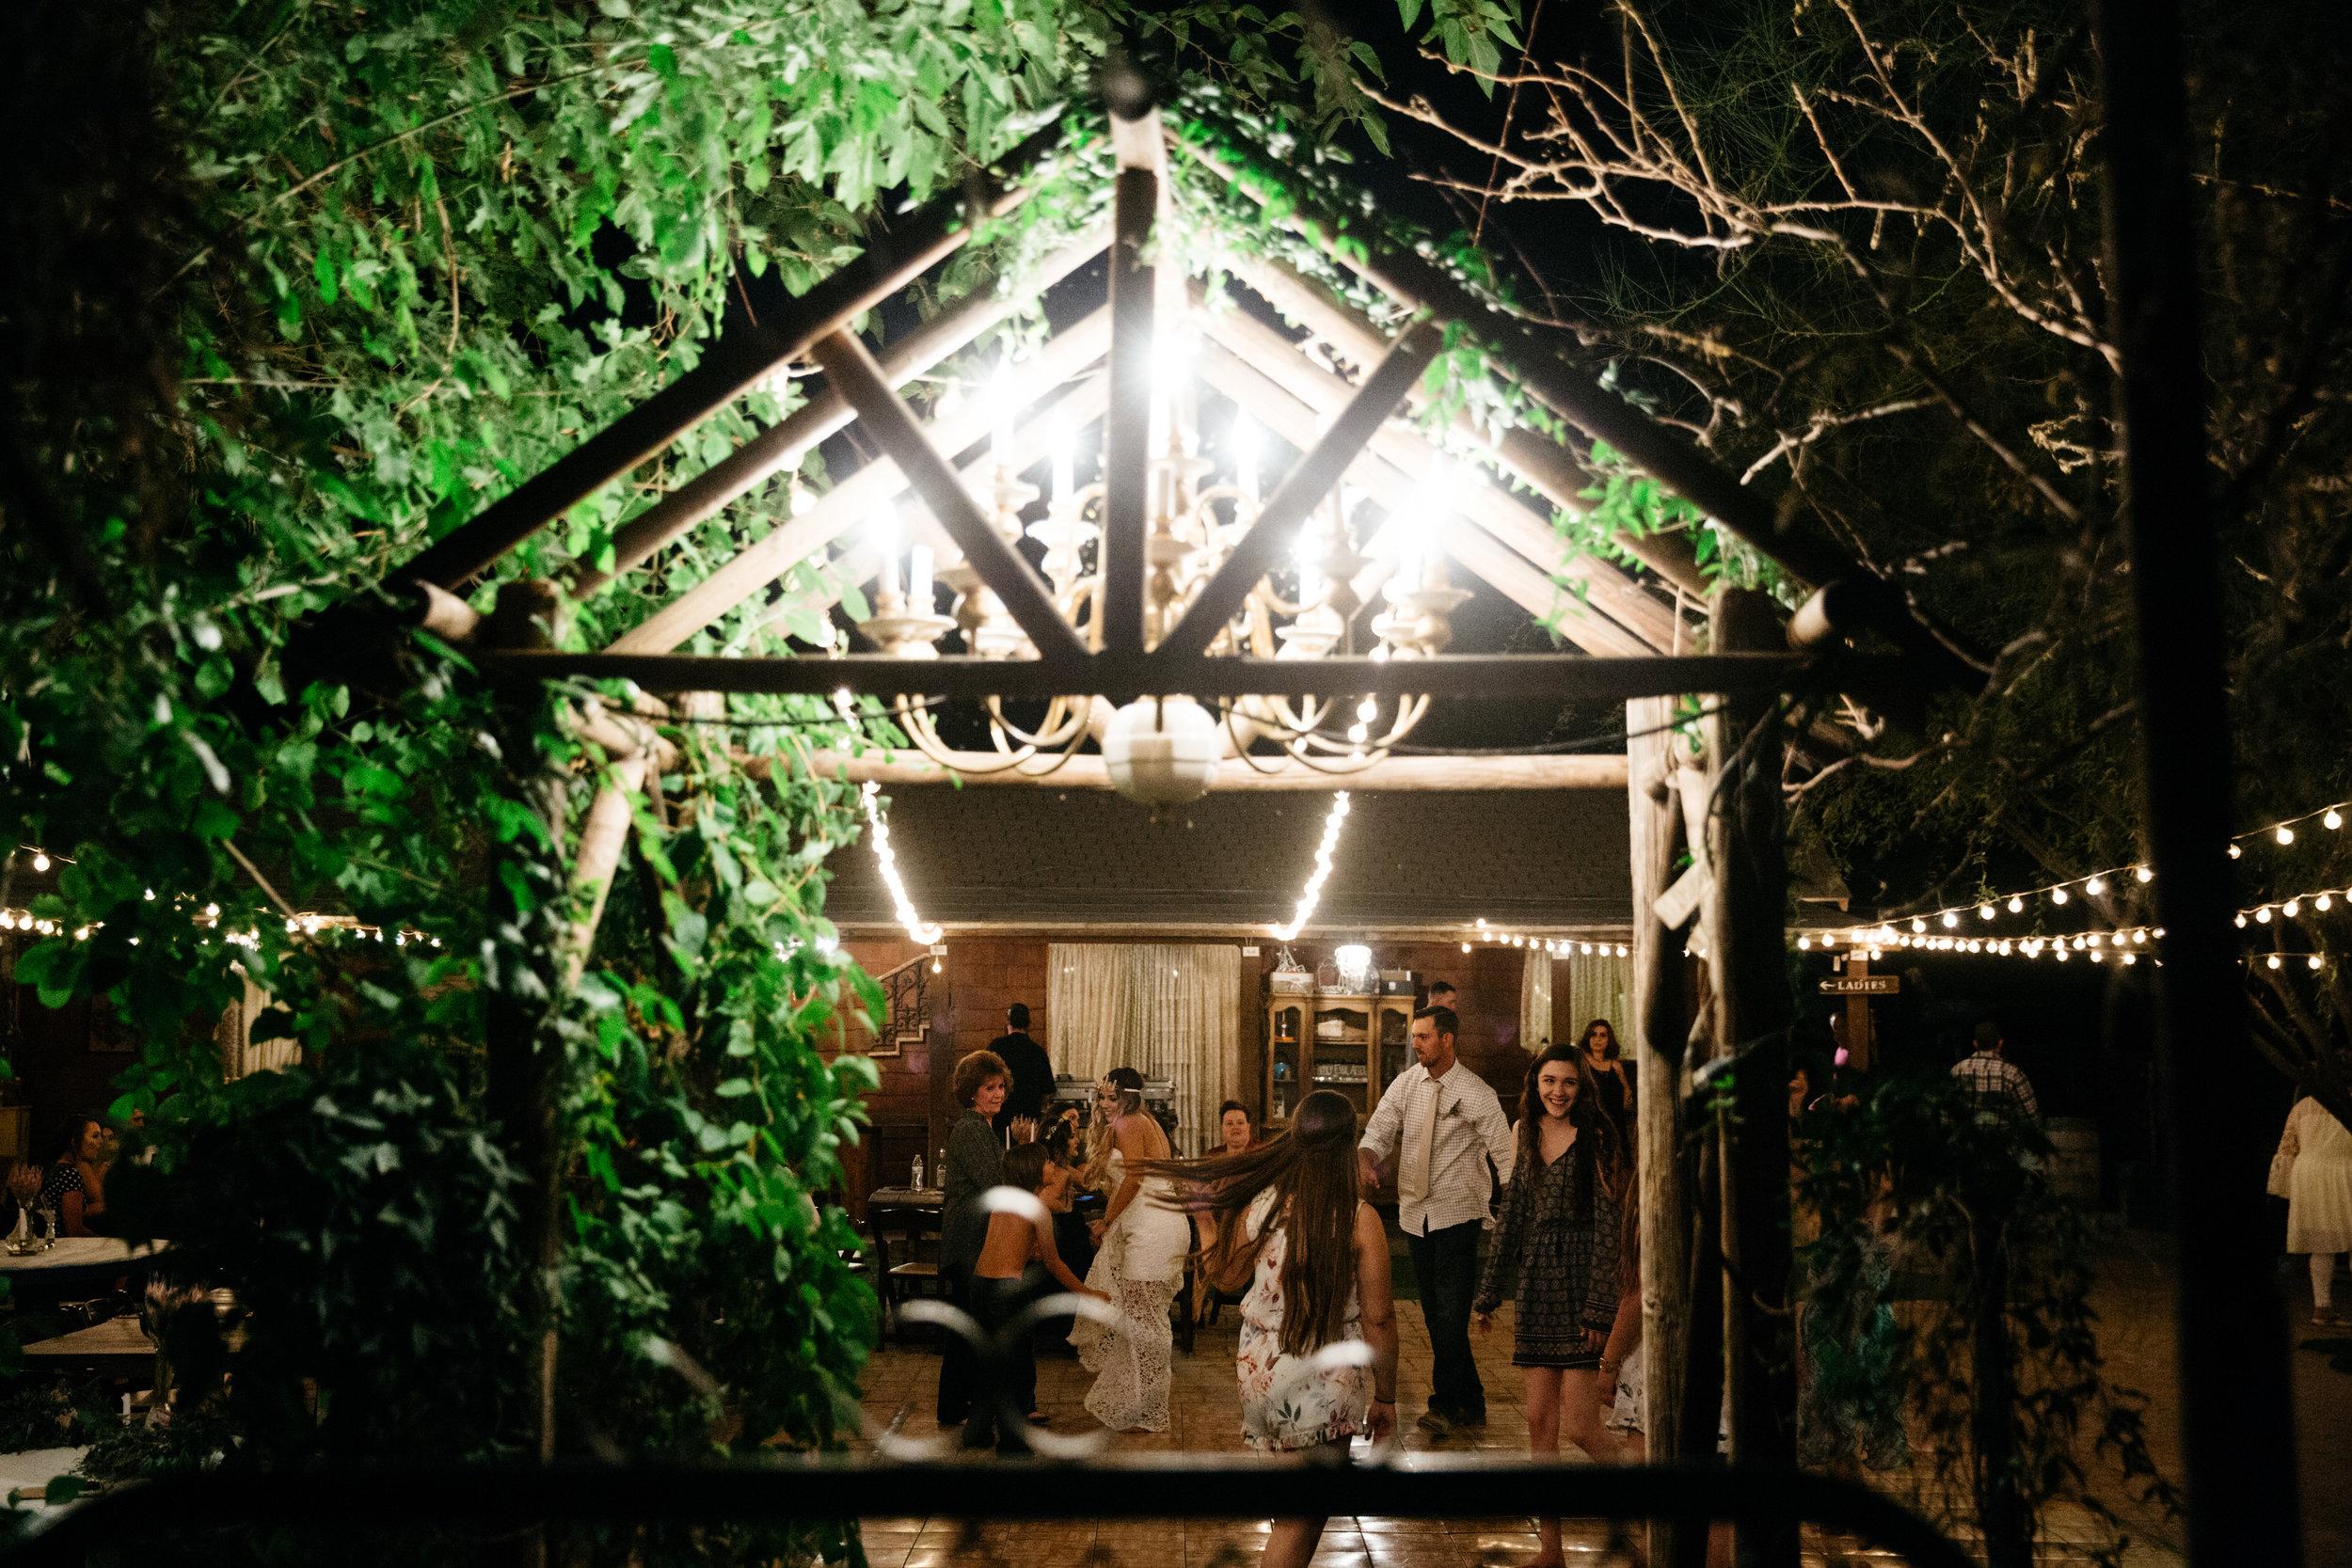 colorado-springs-wedding-photographer-51.jpg